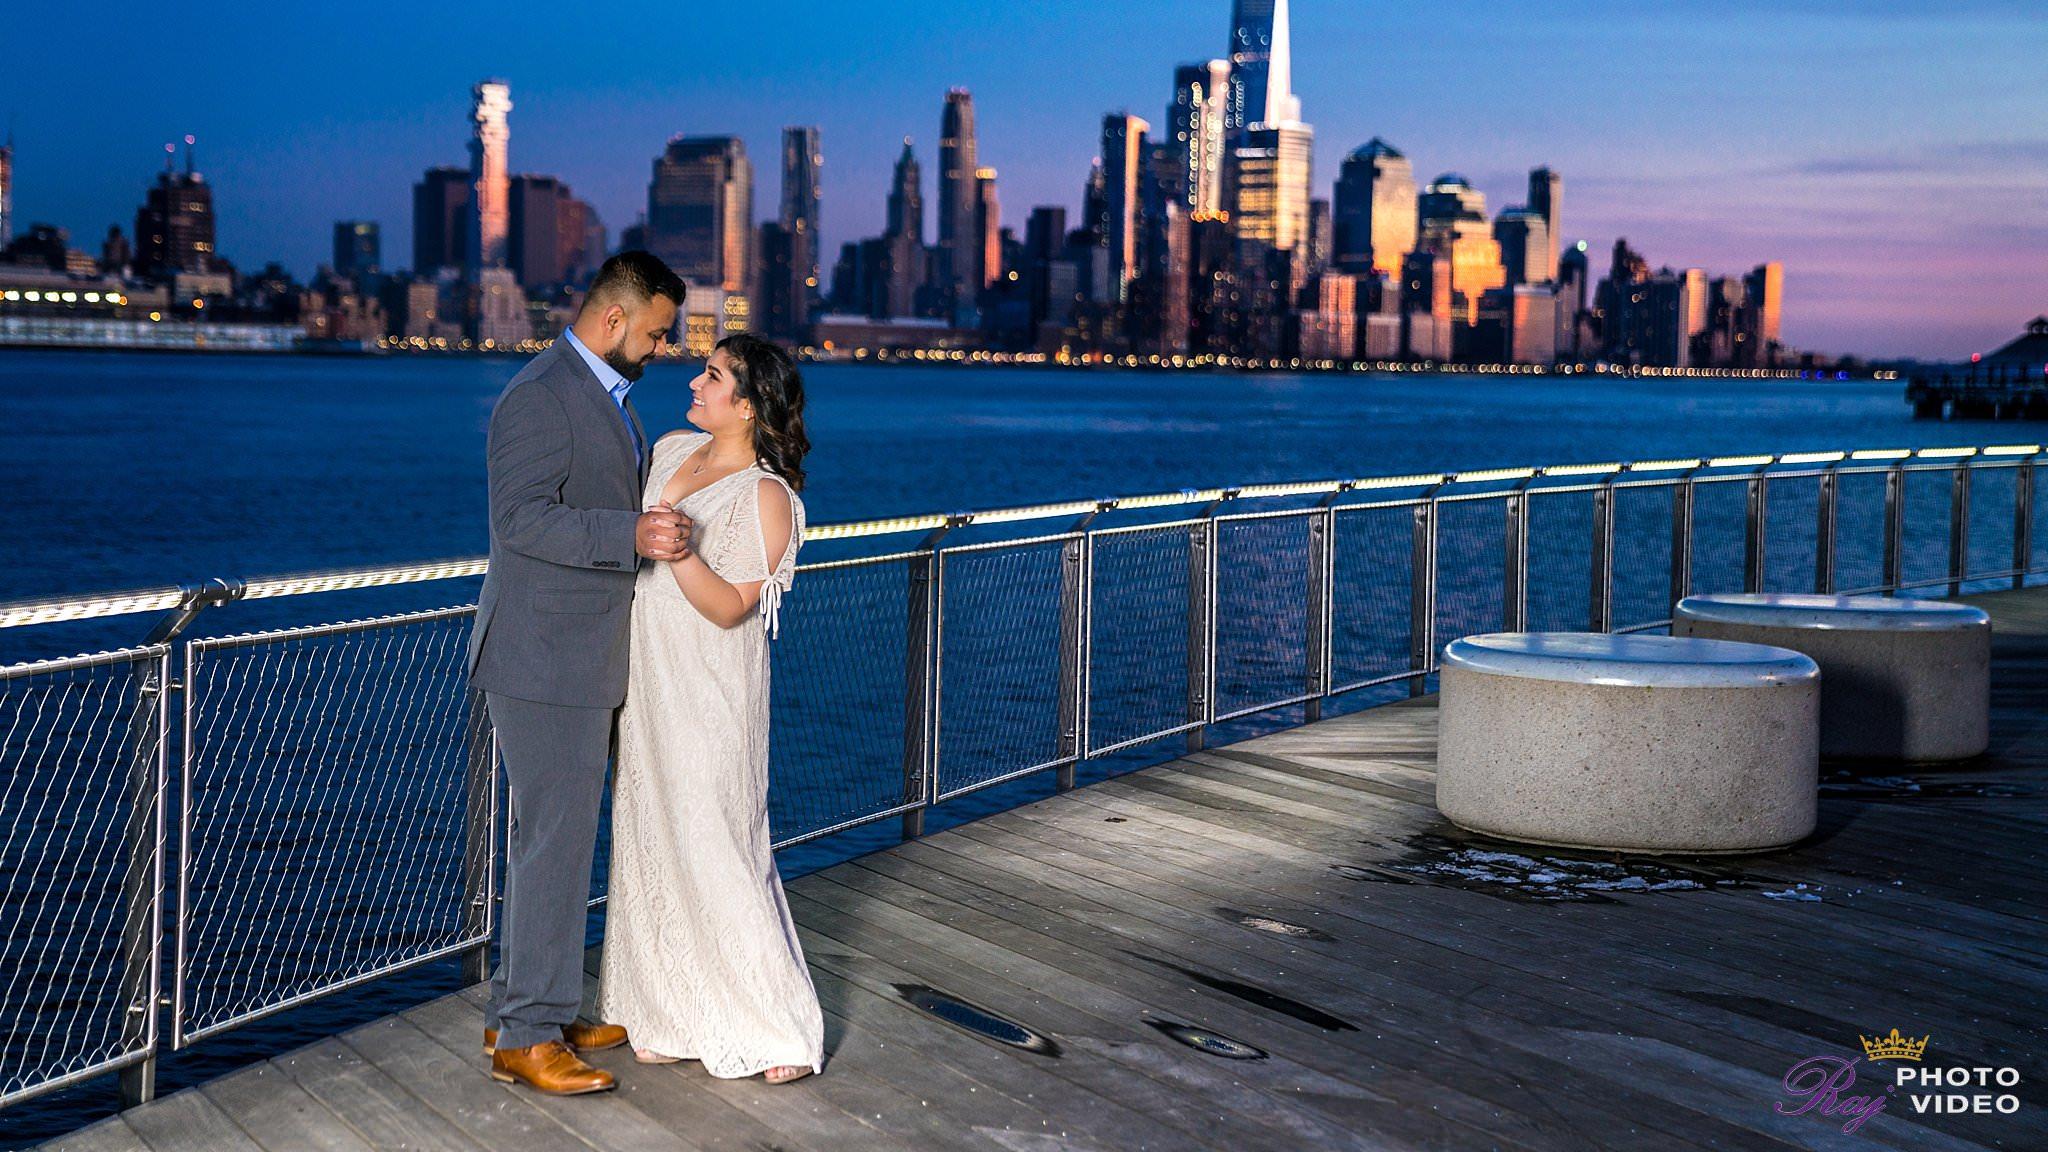 Hoboken-Pier-Engagement-Shoot-Zalak-Parag-00015_Raj_Photo_Video.jpg